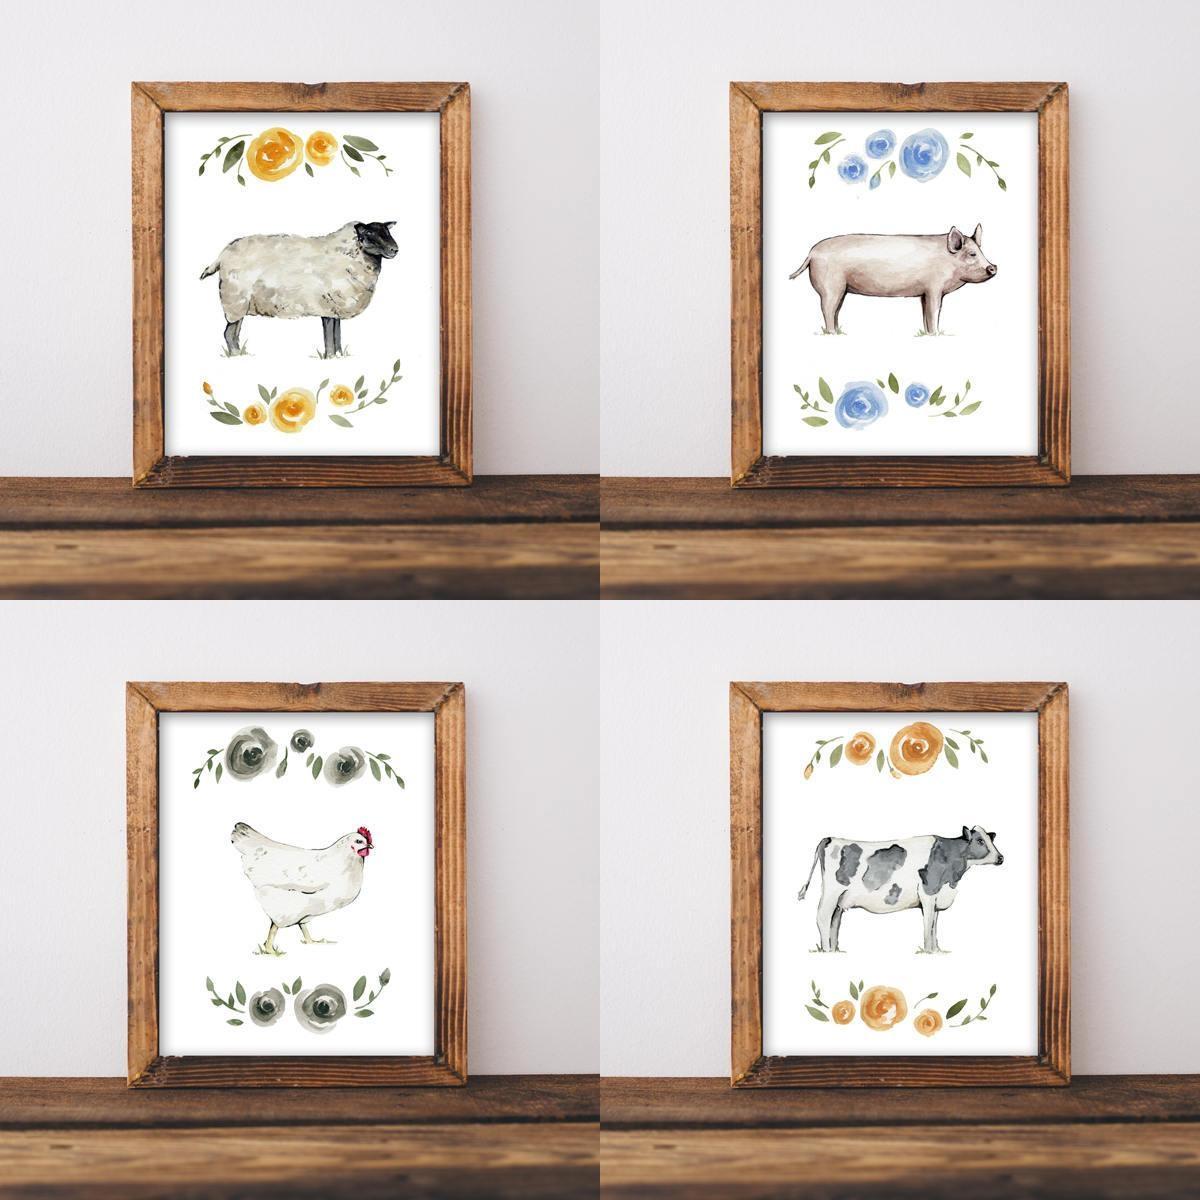 Farmhouse Wall Art, Nursery Wall Art, Shabby Chic Wall Art, Animal Intended For Shabby Chic Wall Art (View 16 of 20)